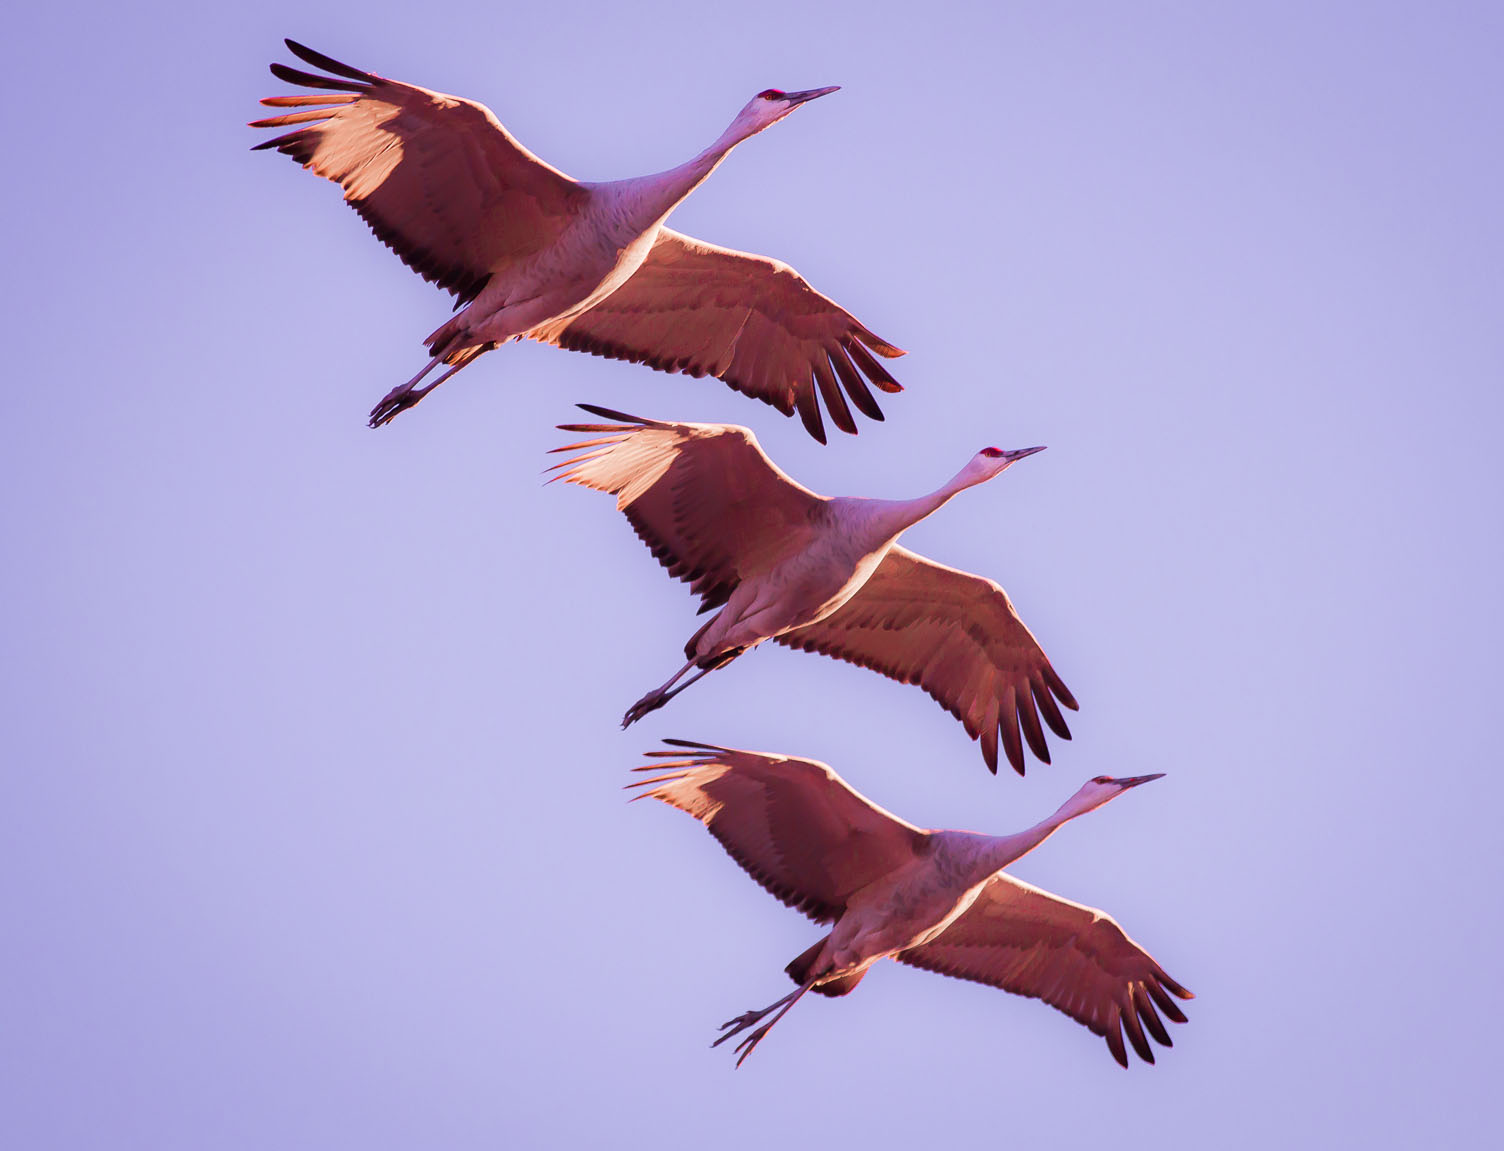 Sandhill Cranes, Bosque del Apache National Wildlife Refuge, San Antonio NM, December 8, 2012